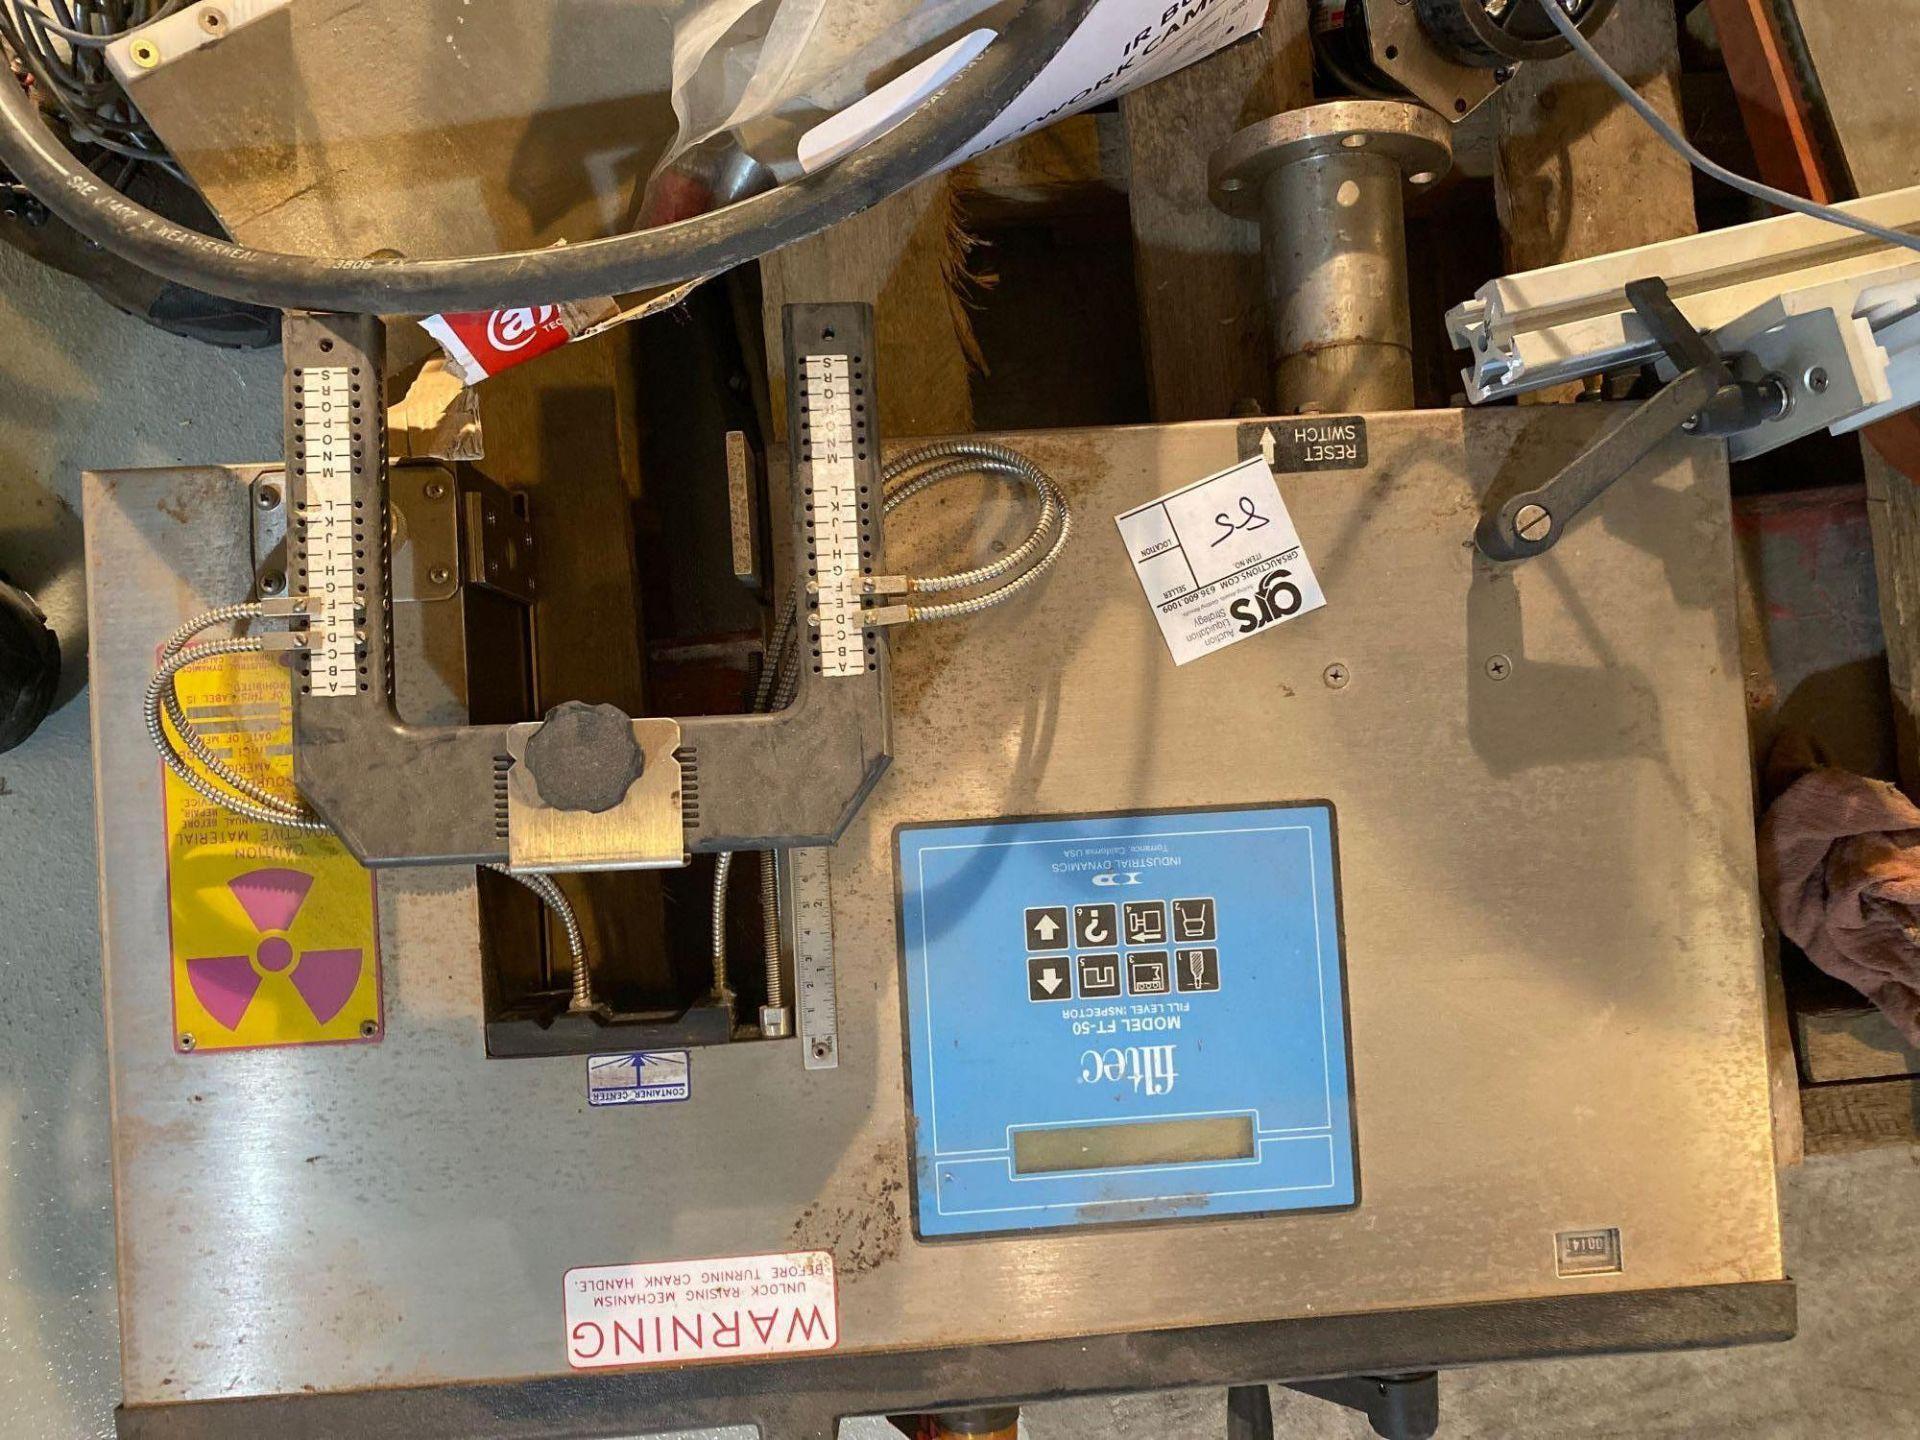 Filtec Jr Model FT 50 Fill Level Inspector - Image 12 of 14